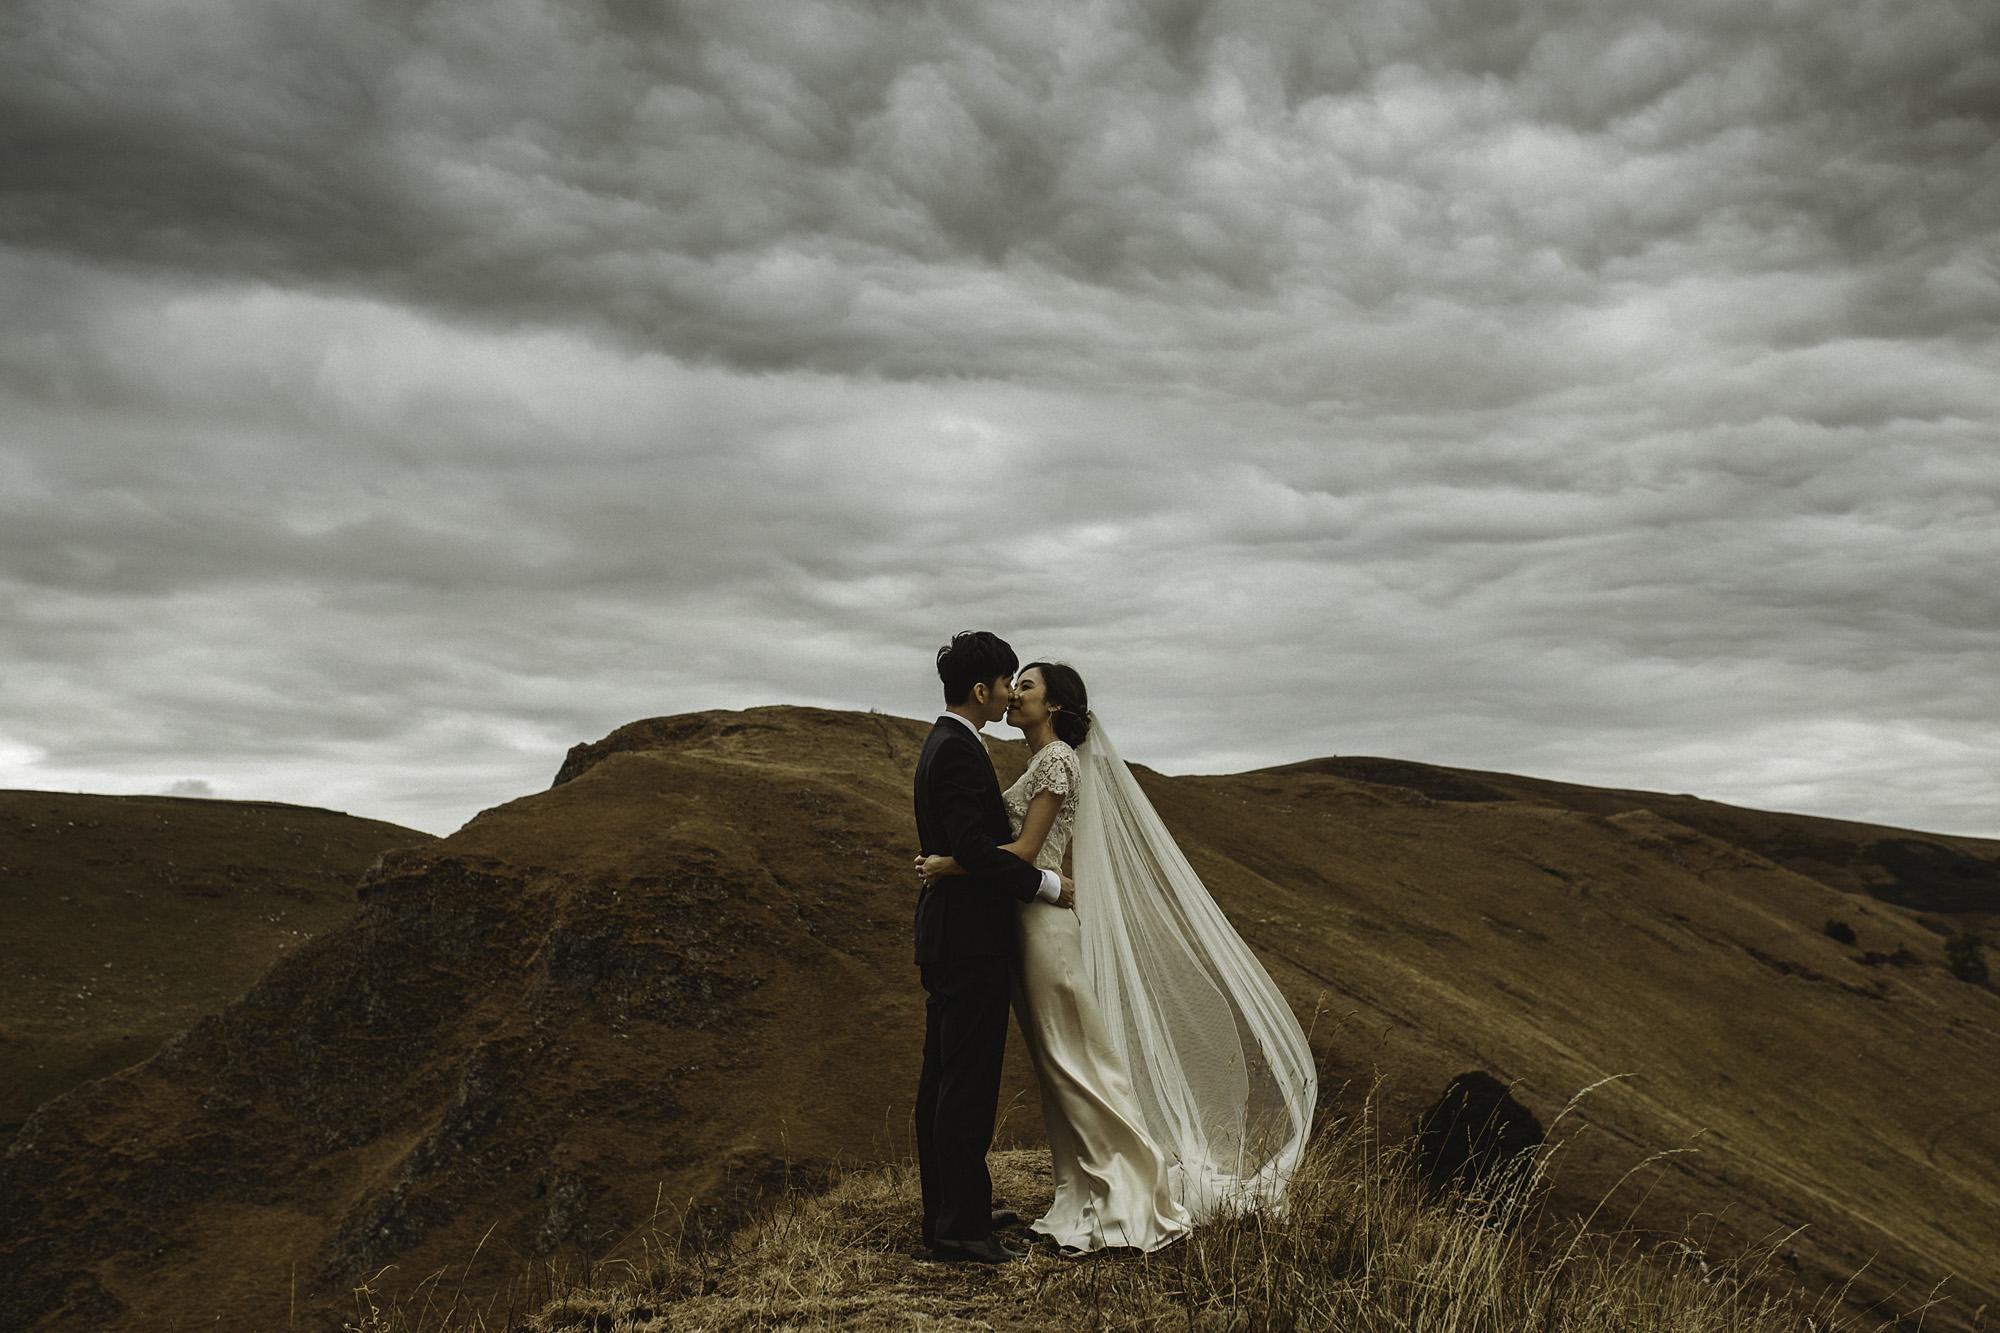 Kate-Beaumont-Wedding-Dress-Bridal-Separates-Peak-District-Shoot-1.jpg